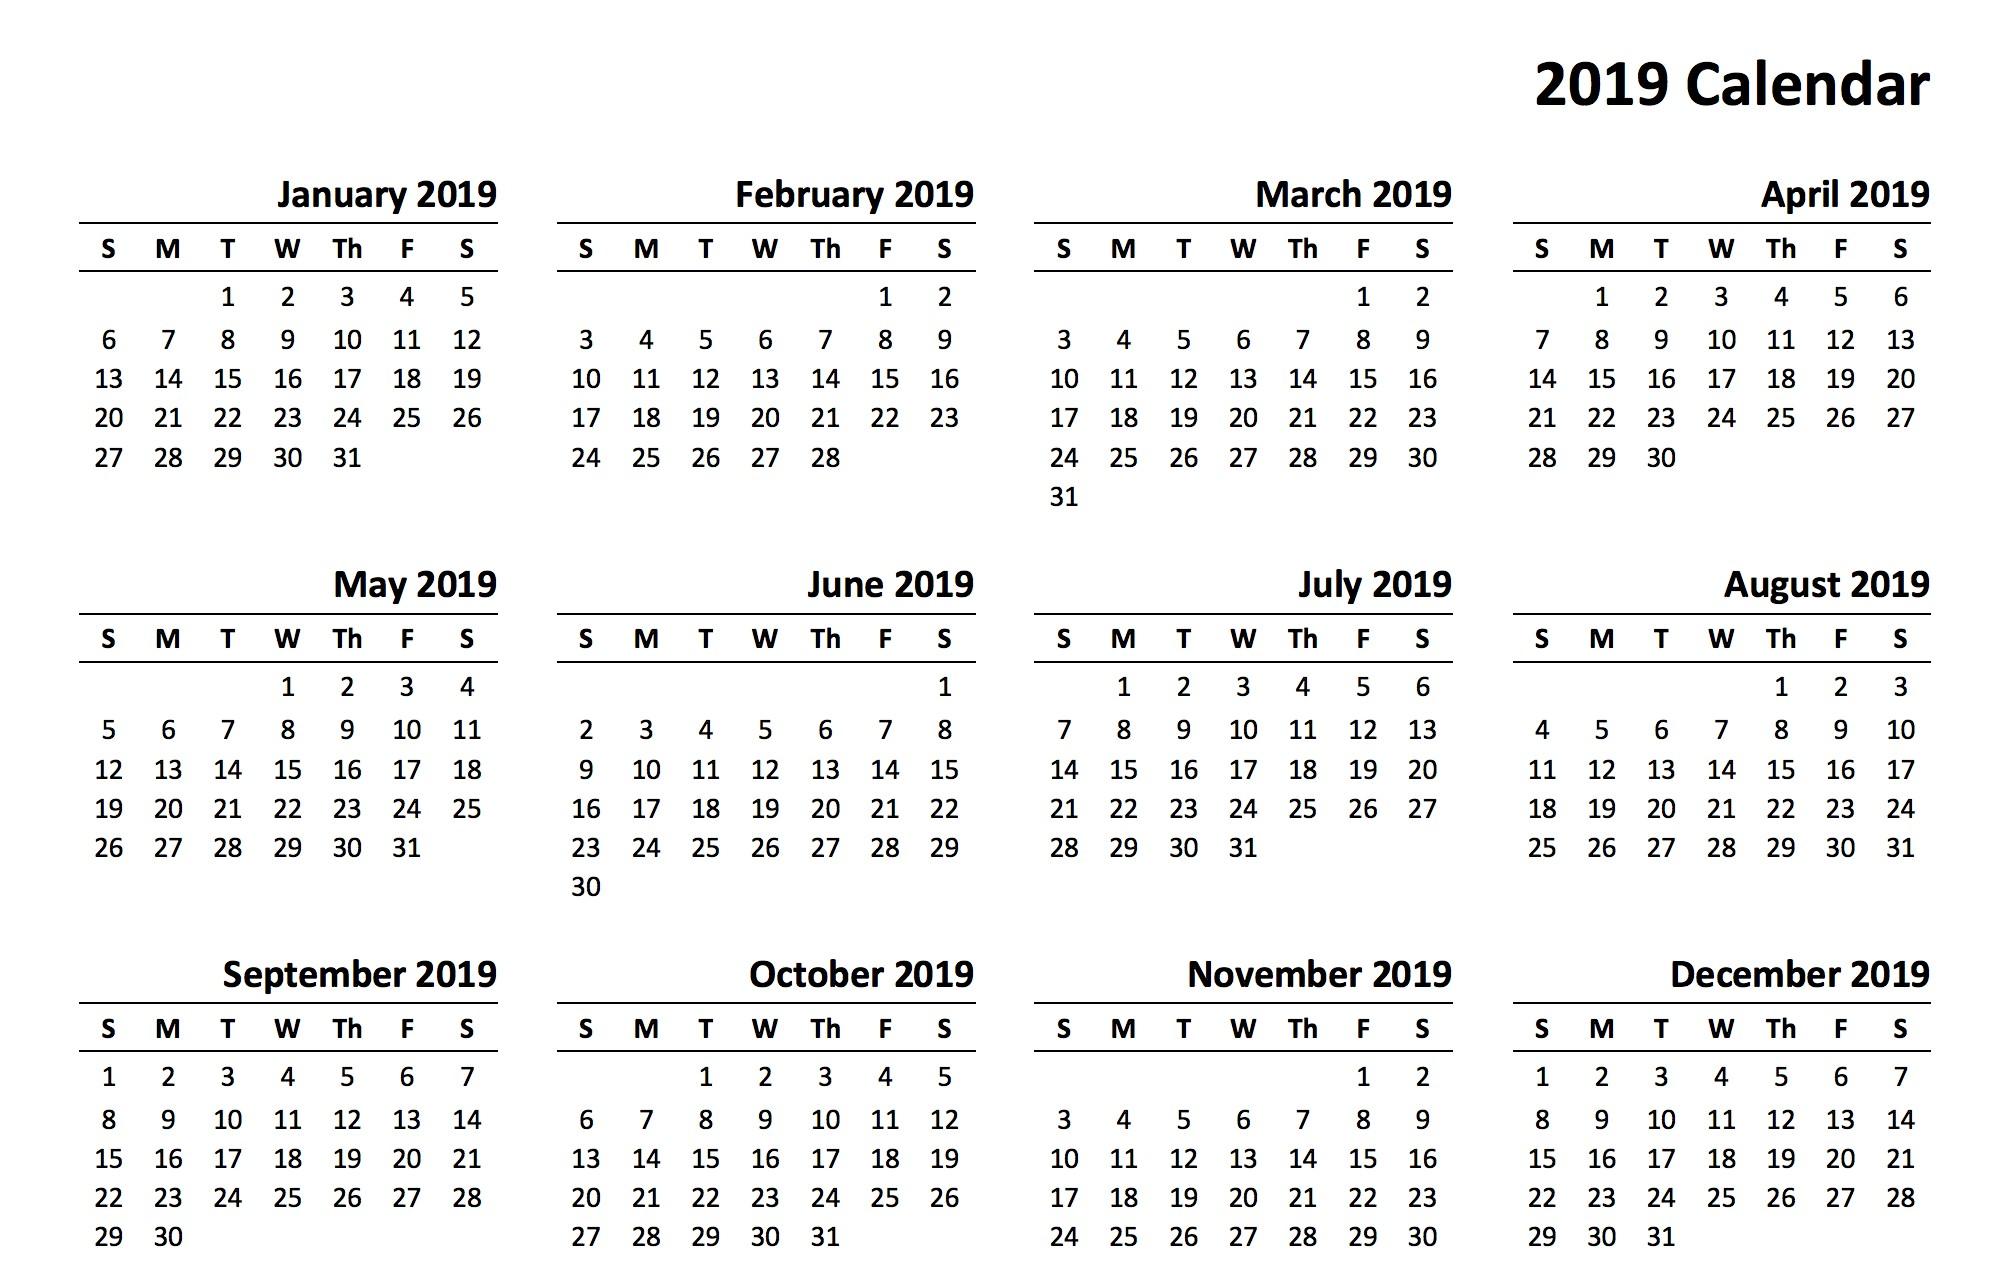 2019 and 2019 Calendar Printable Free 2019 Printable Calendar Templates Pdf Excel Word Free